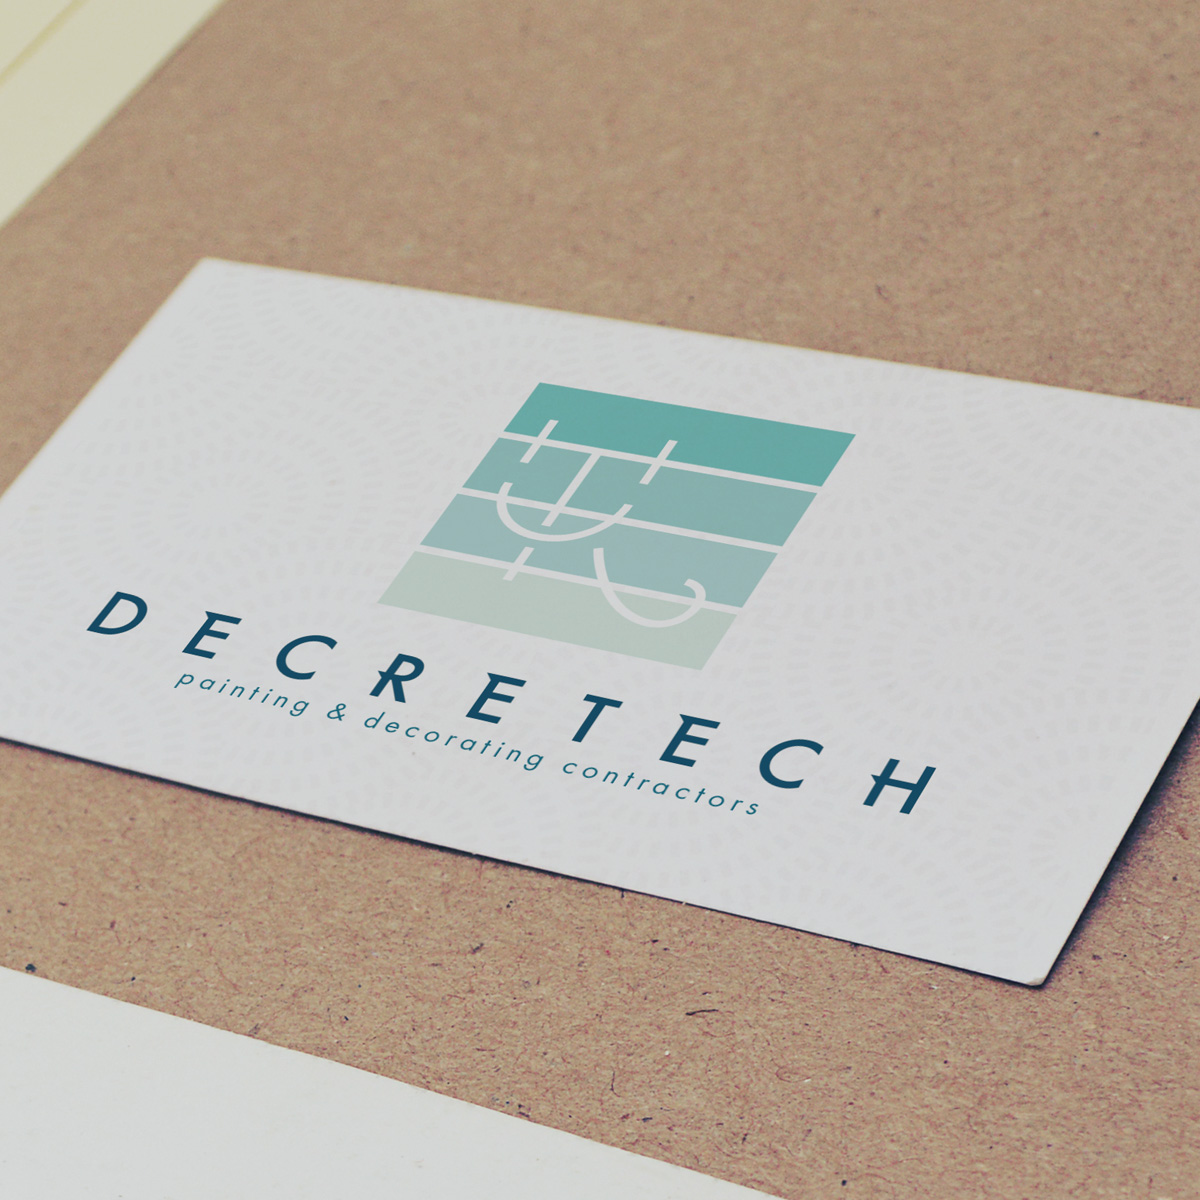 Promoworx - Decretech Business Card